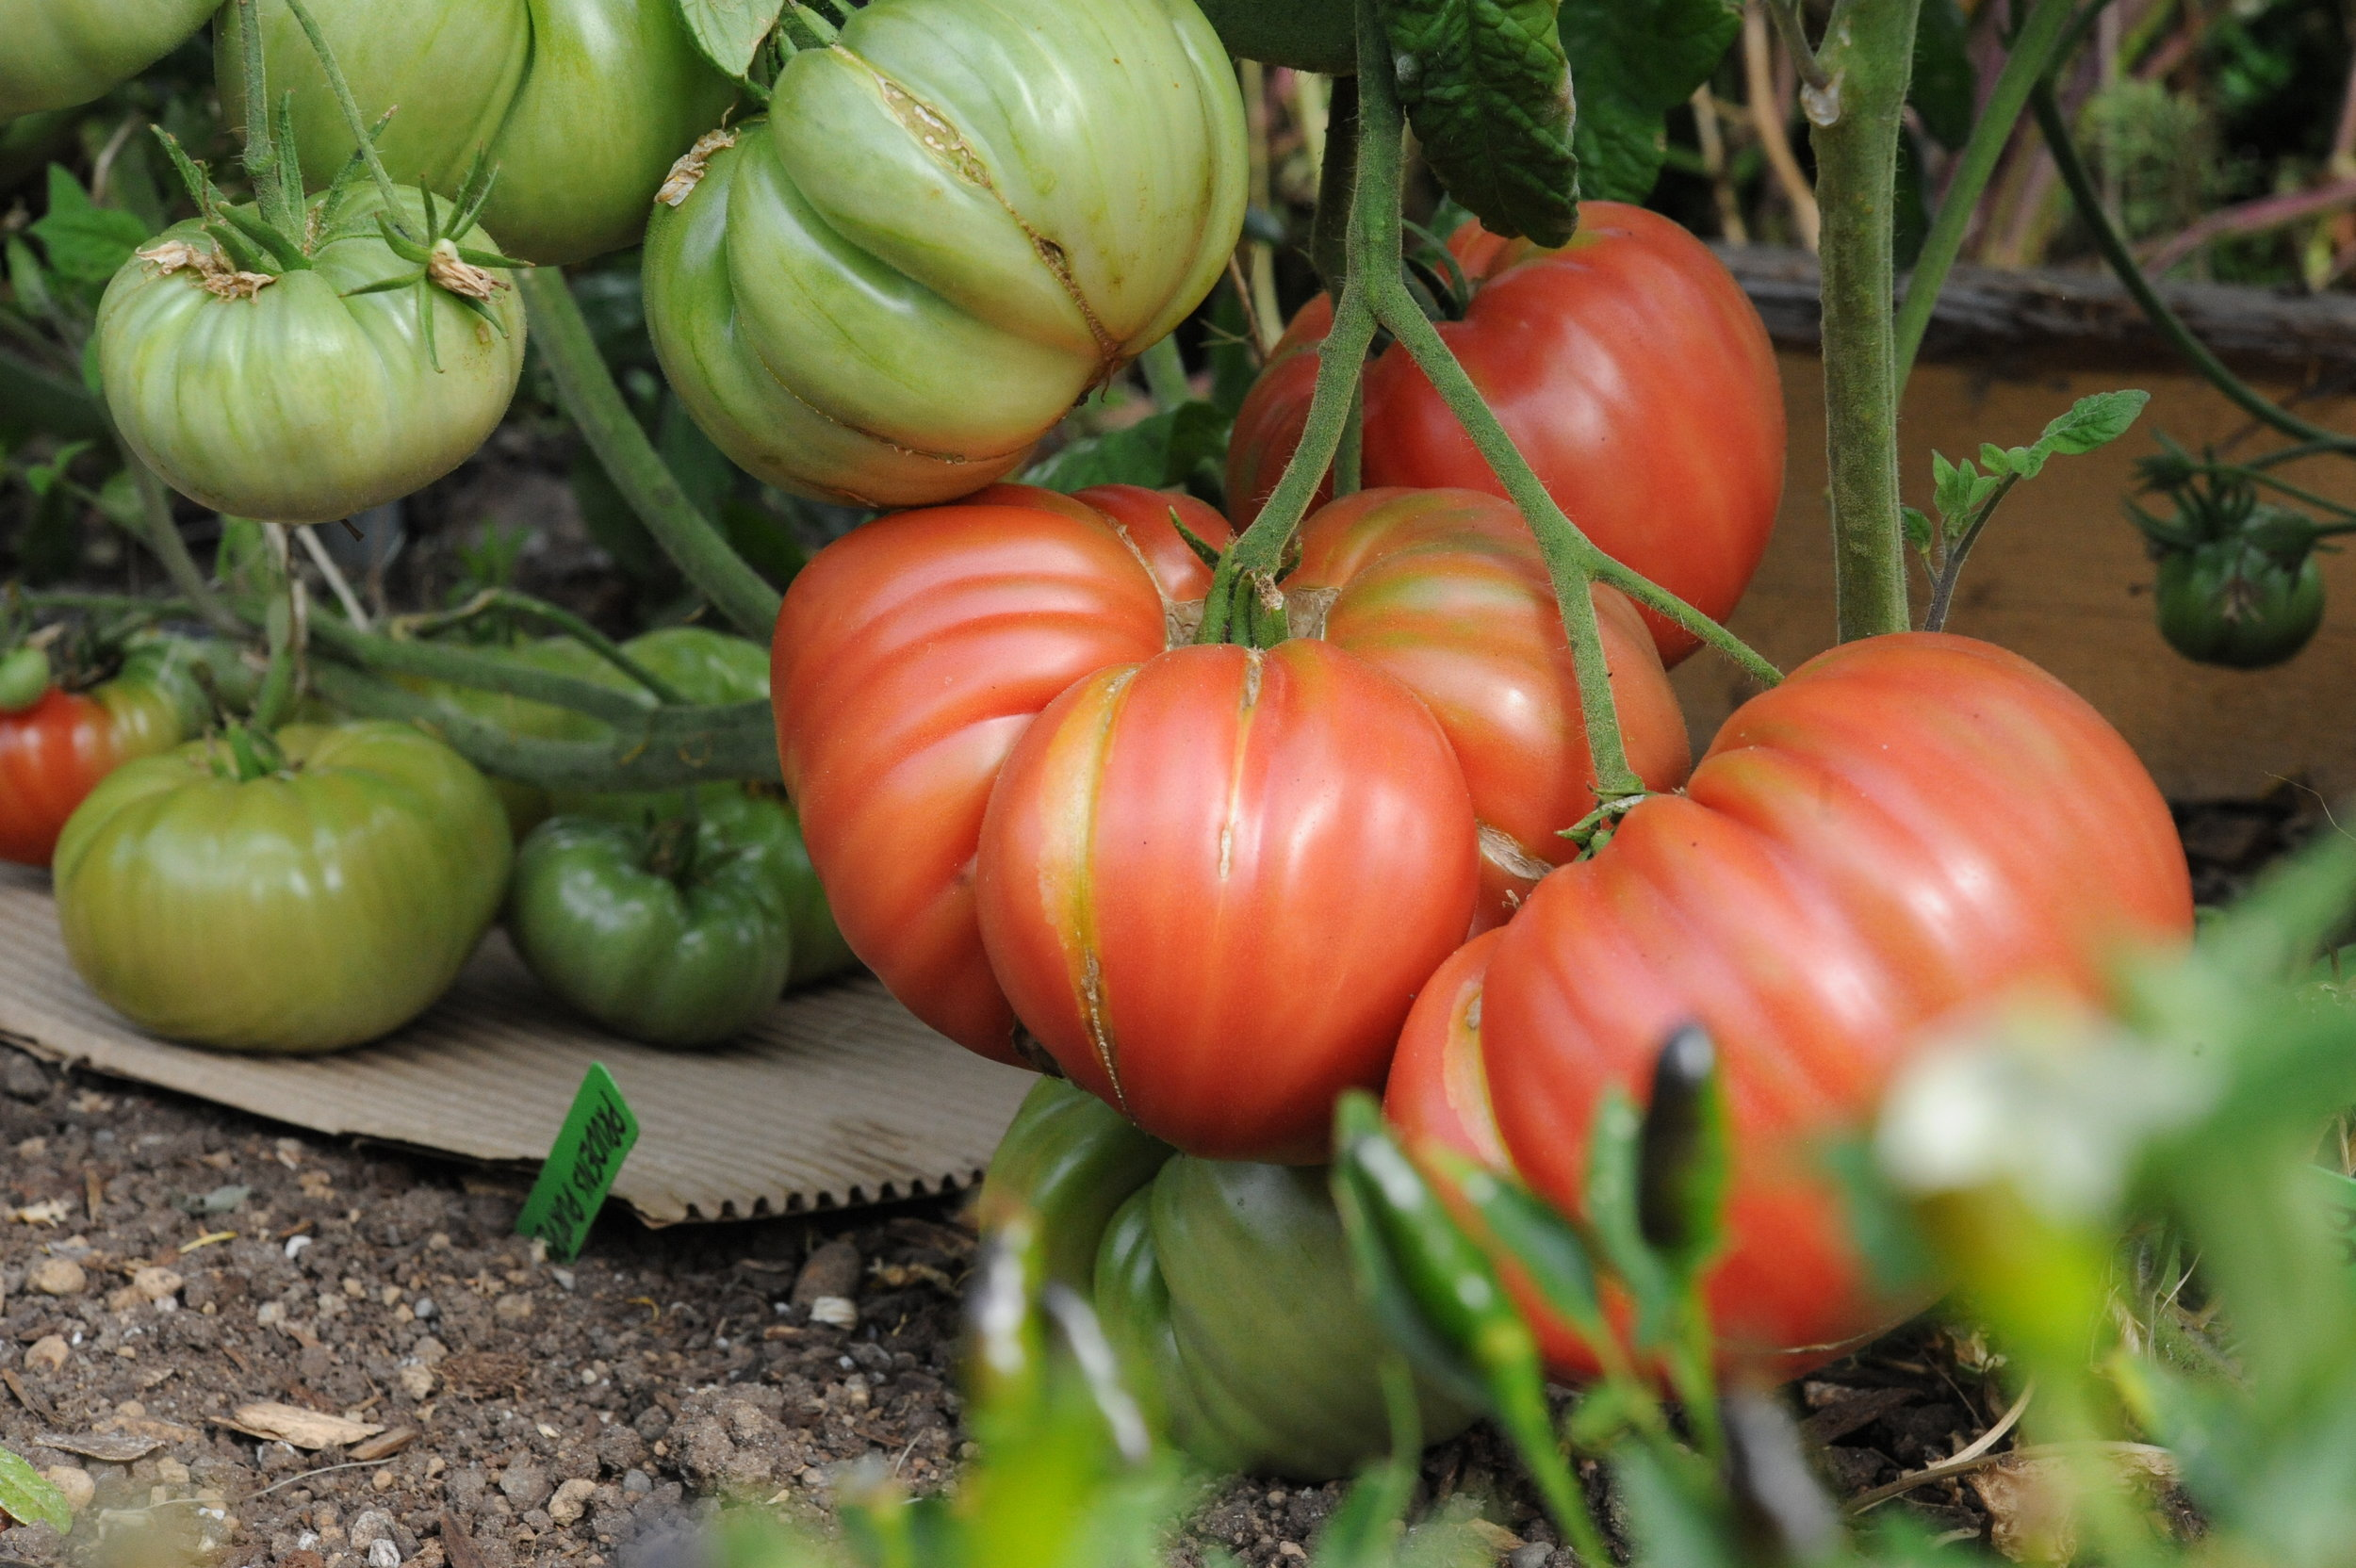 Tomatoes on cardboard_Hilary Dahl_Encyclopedia Botanica.JPG